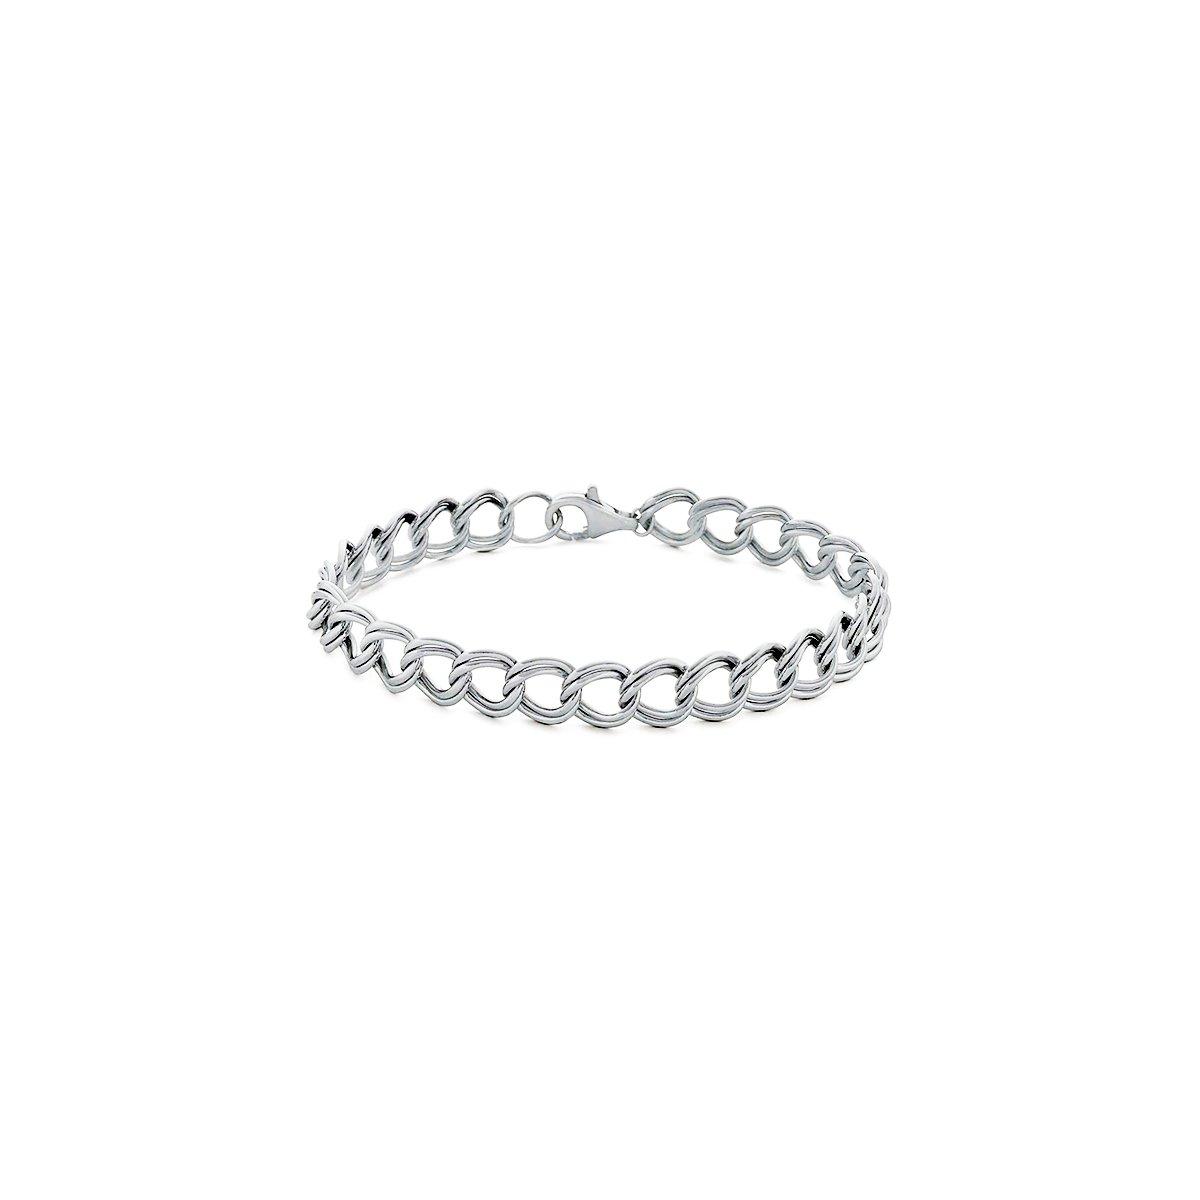 Orostar Sterling Silver 925 Italian 4mm Double Link Charm Bracelet, Sizes 5'' - 9'' (8)